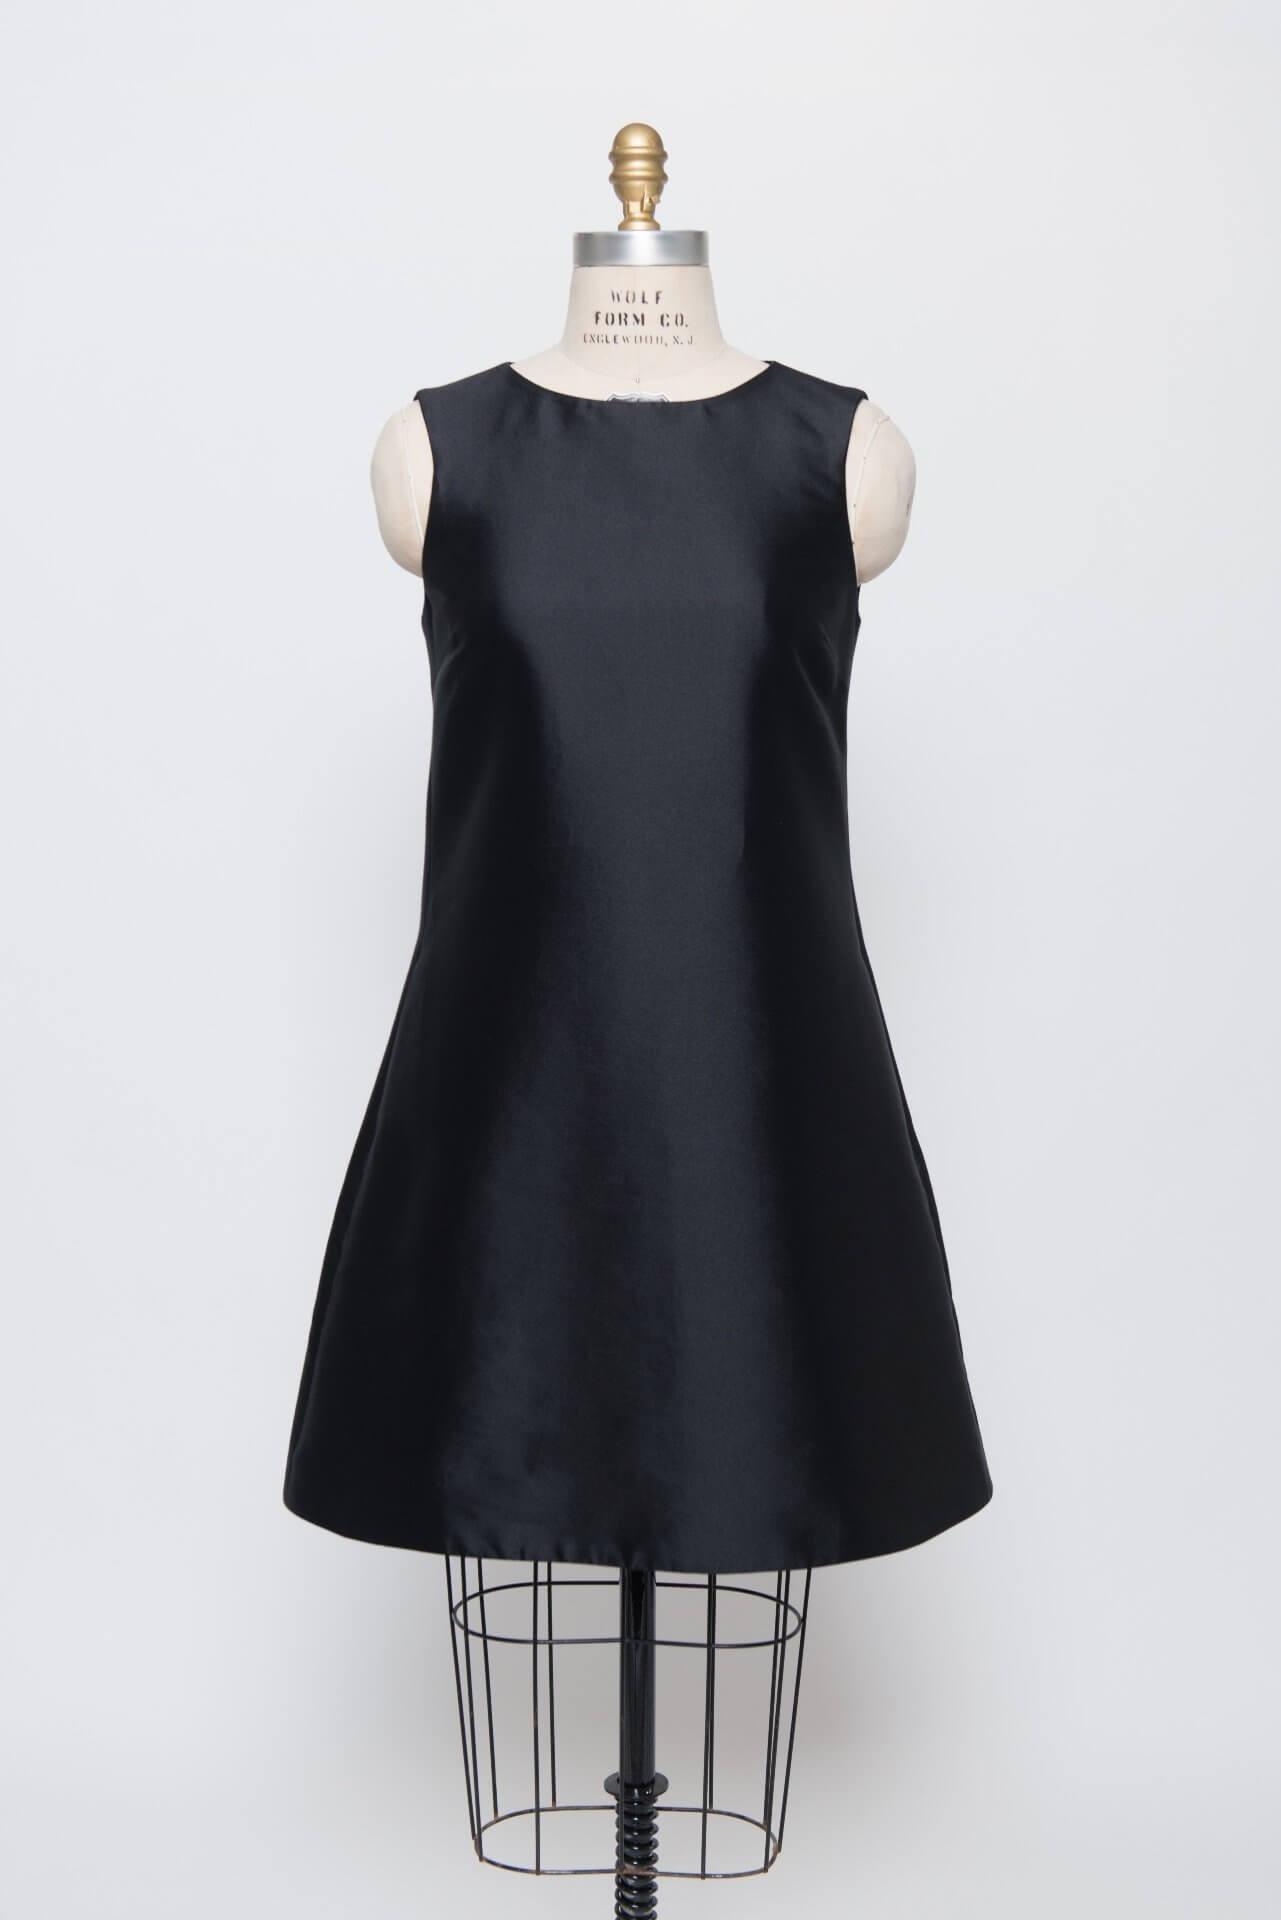 La Dolce Vita Inspiration and the Little Black Dress